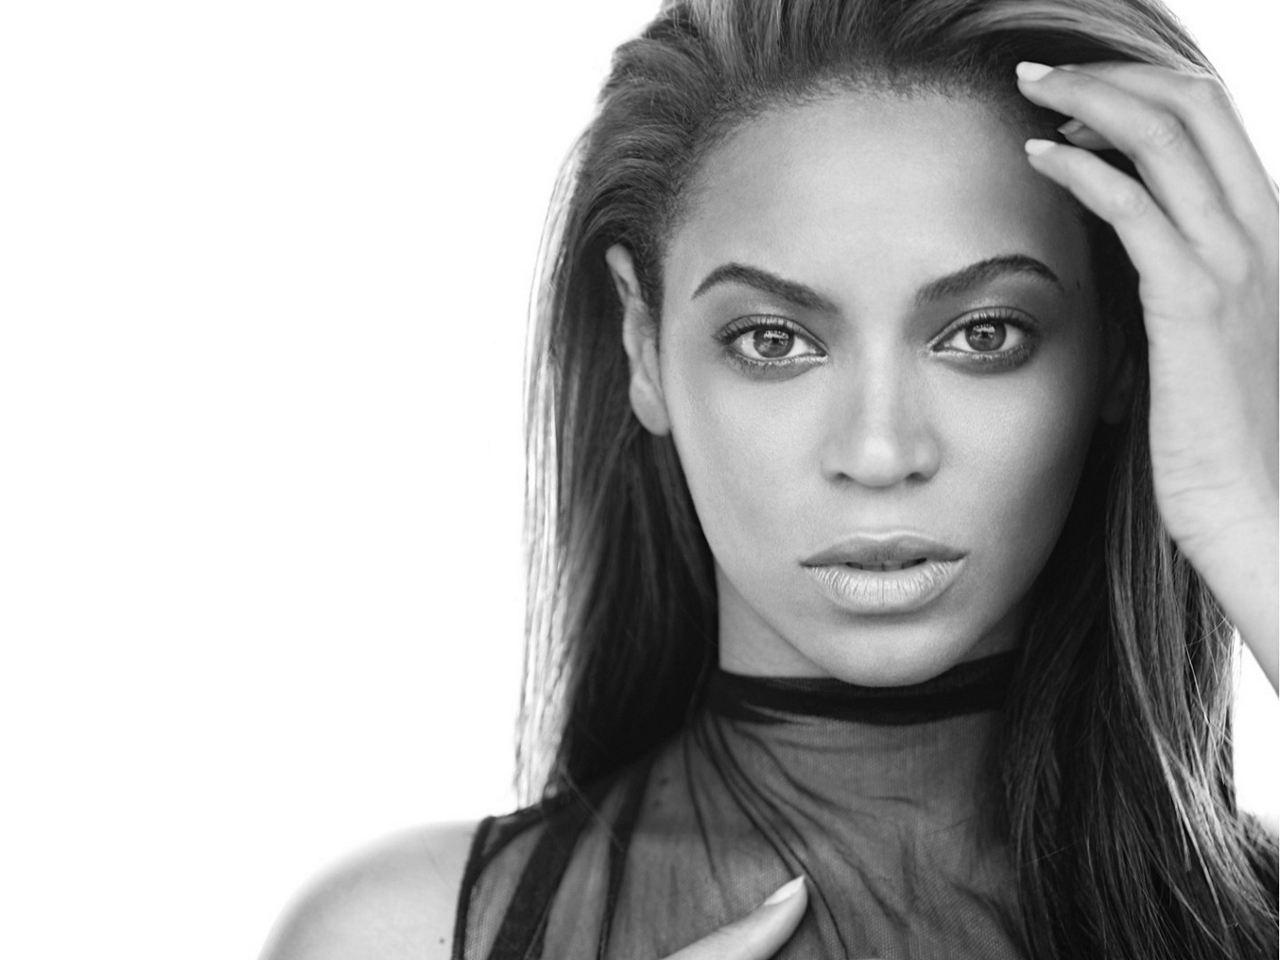 Hustletv-Beyonce-IASF-beyonce-32700249-1280-960.jpg